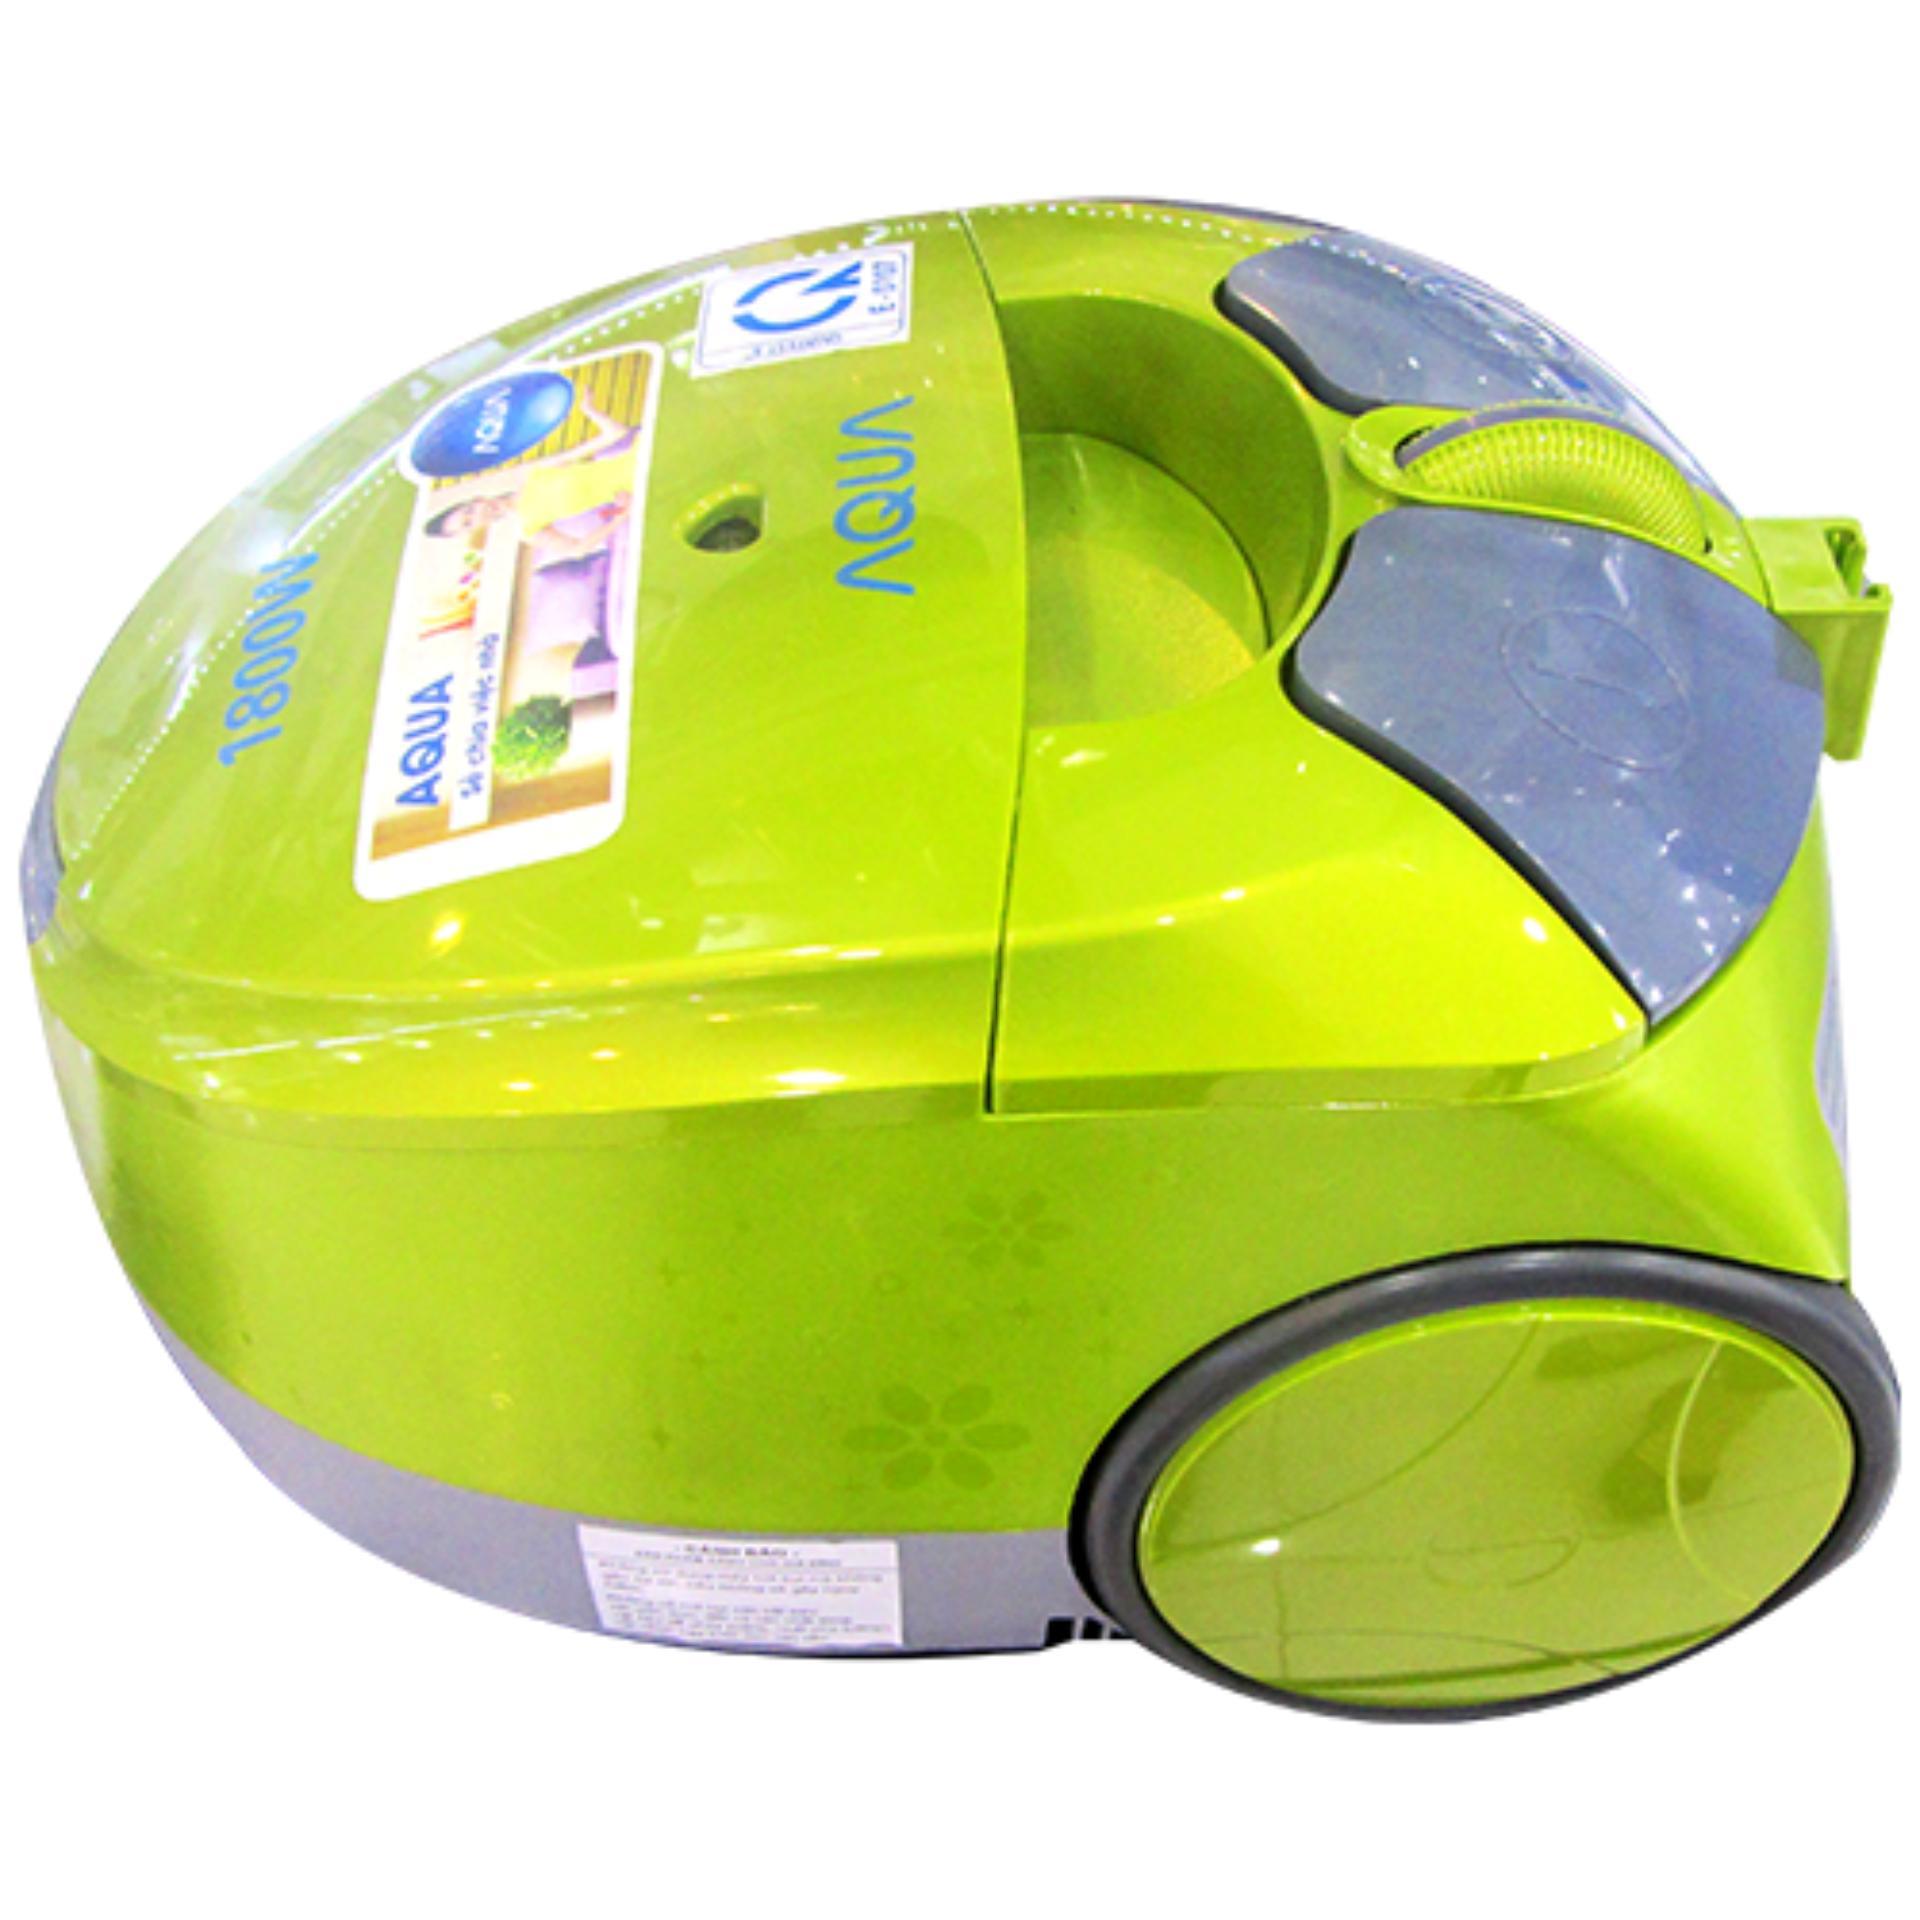 Máy Hút Bụi Aqua AC-E930 (Xanh lá)